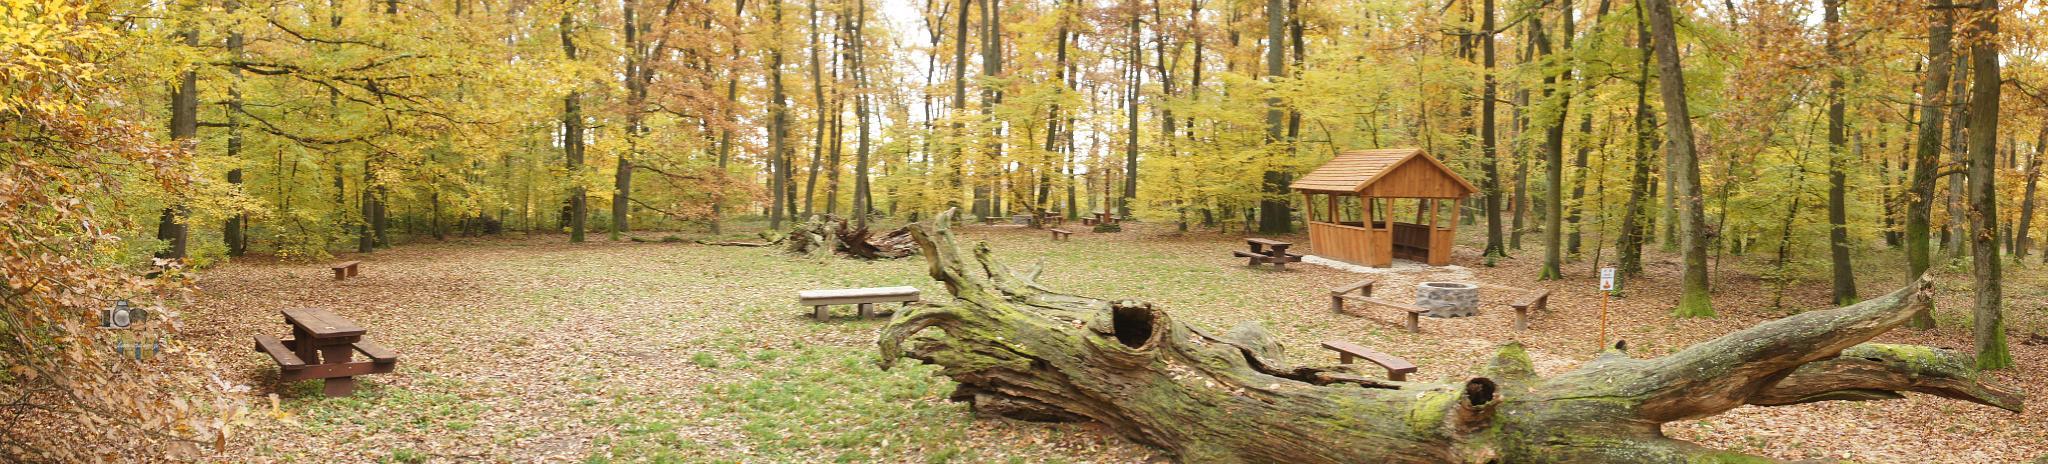 forest landscape with old oak by hunyadigeza